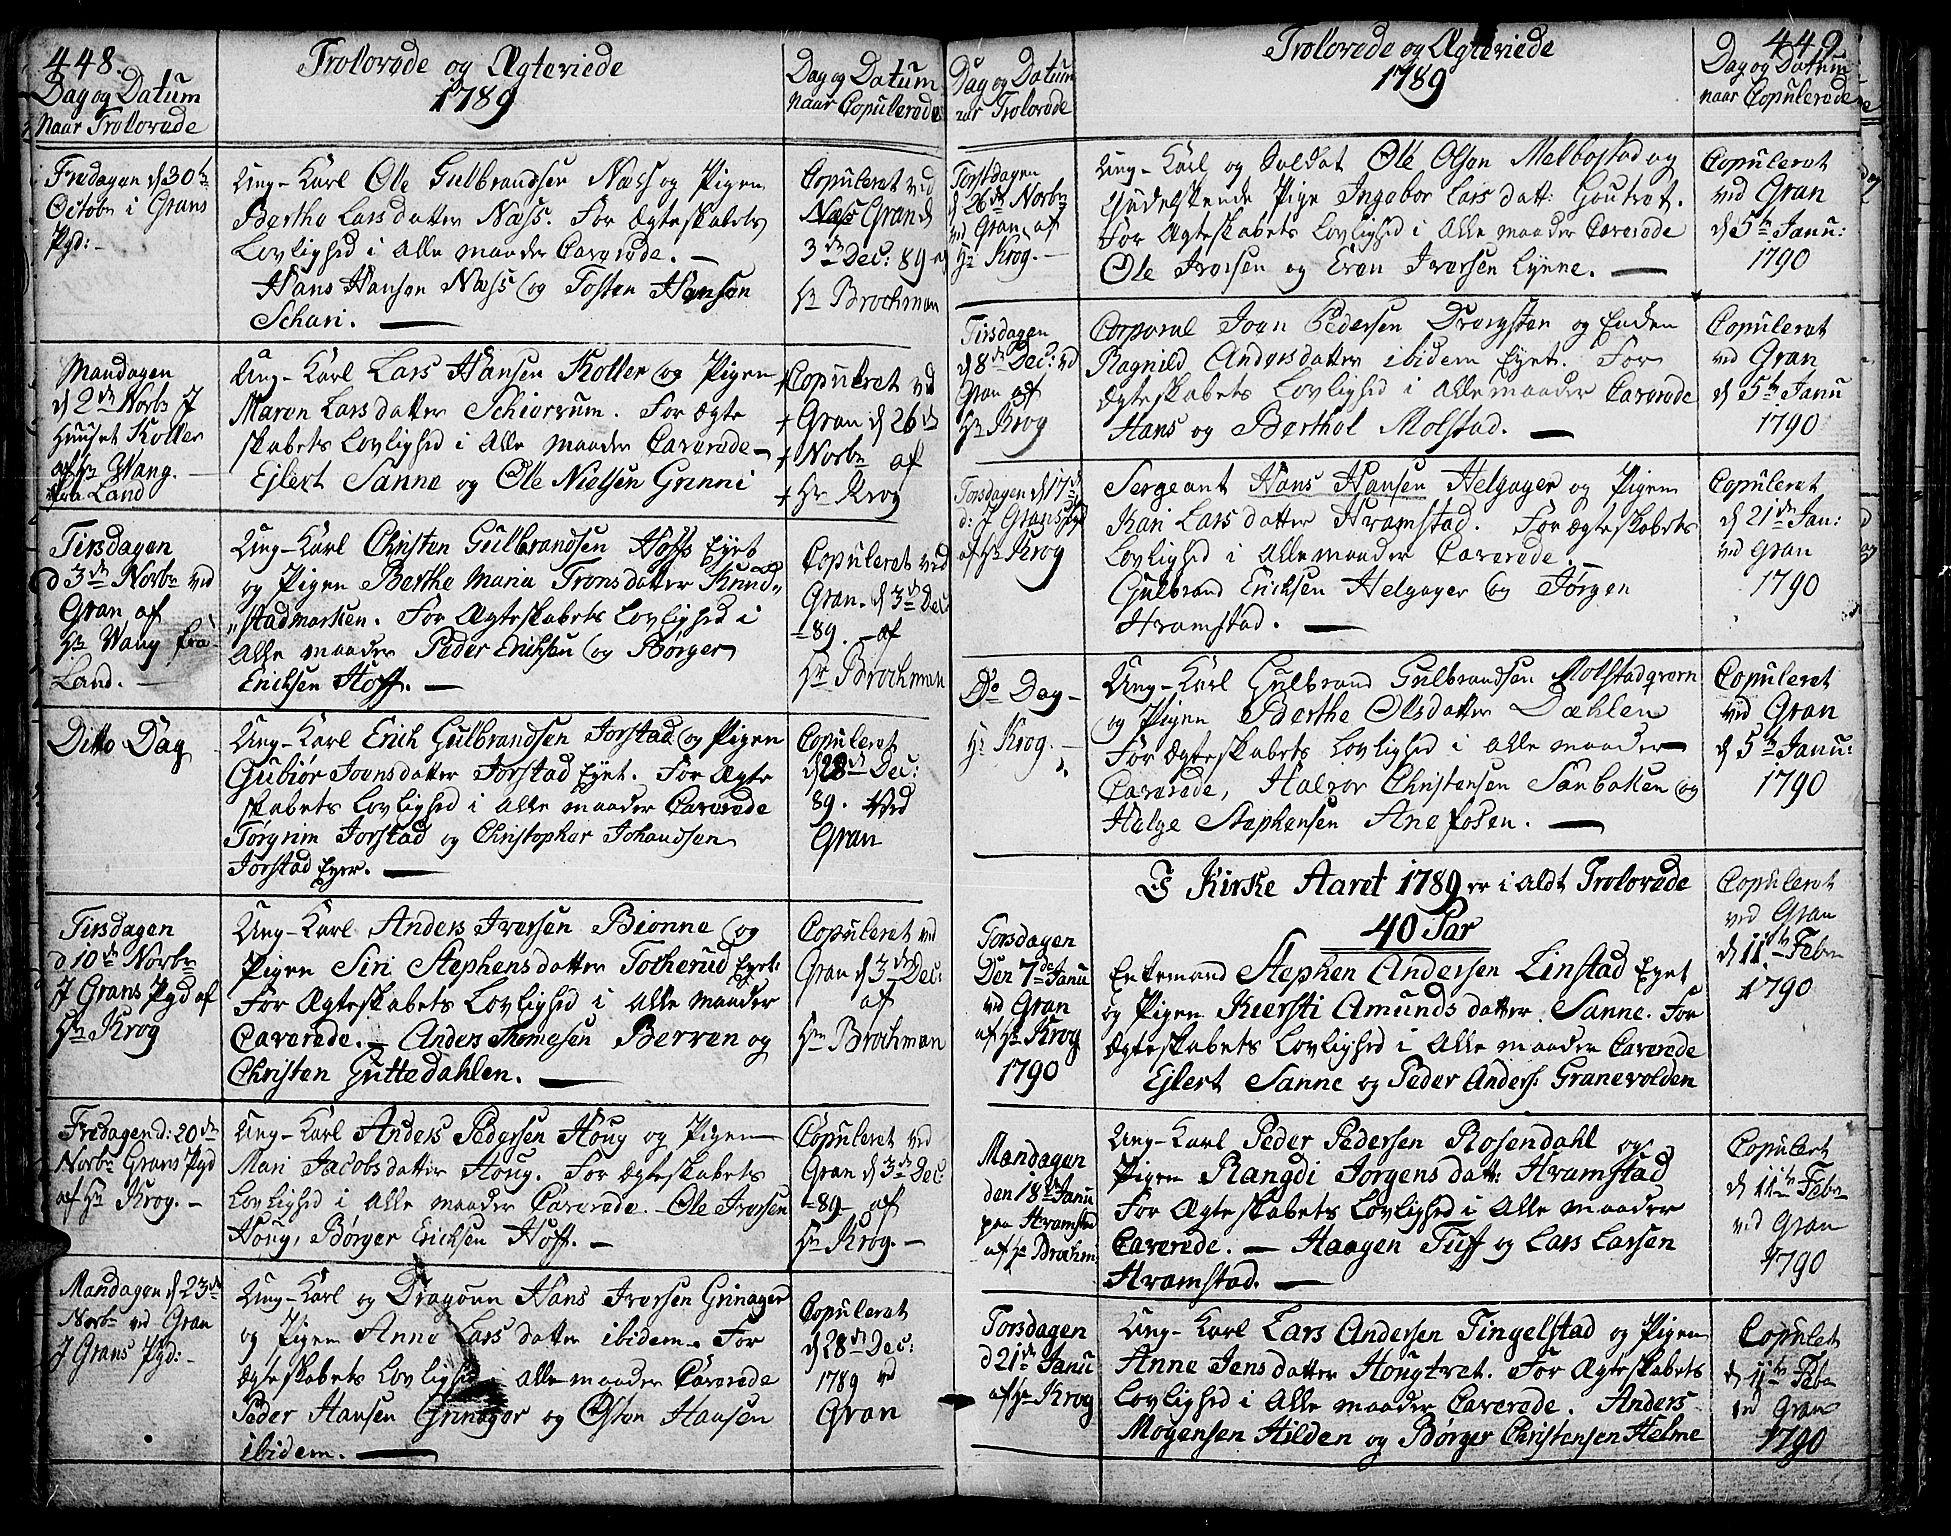 SAH, Gran prestekontor, Ministerialbok nr. 6, 1787-1824, s. 448-449